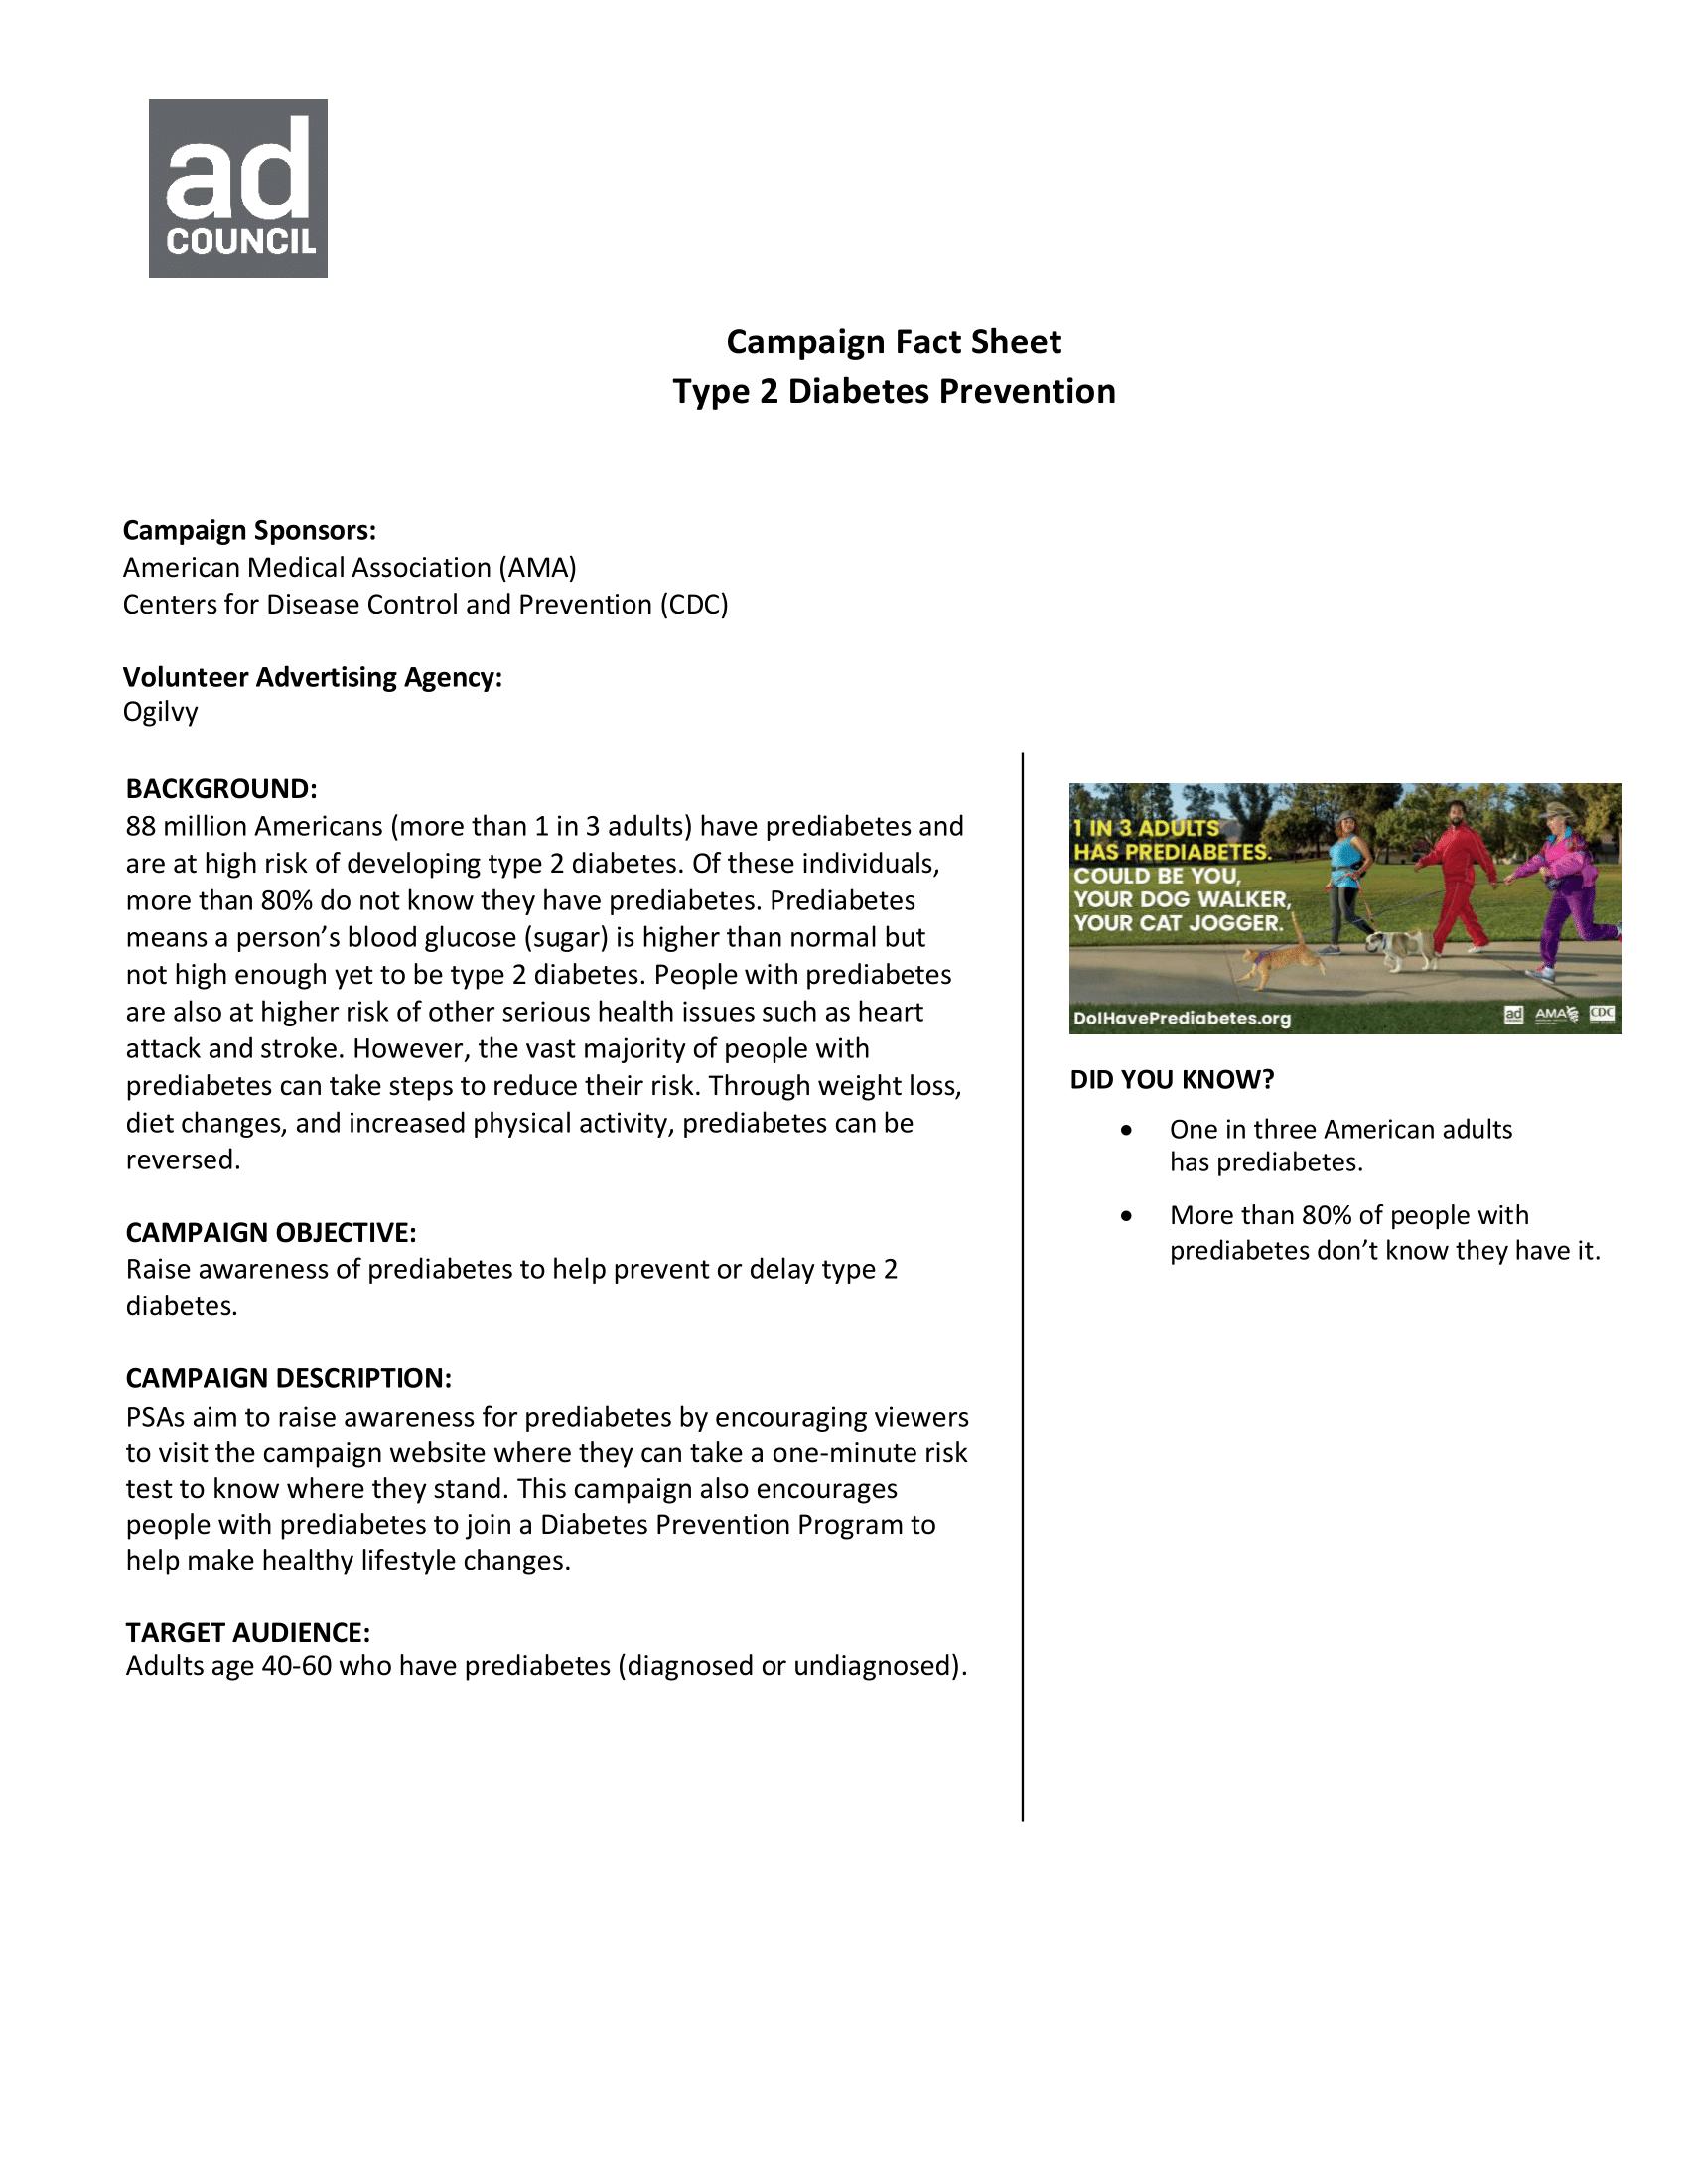 Type2DiabetesPrevention_Fact-Sheet_Aug2020-1.png